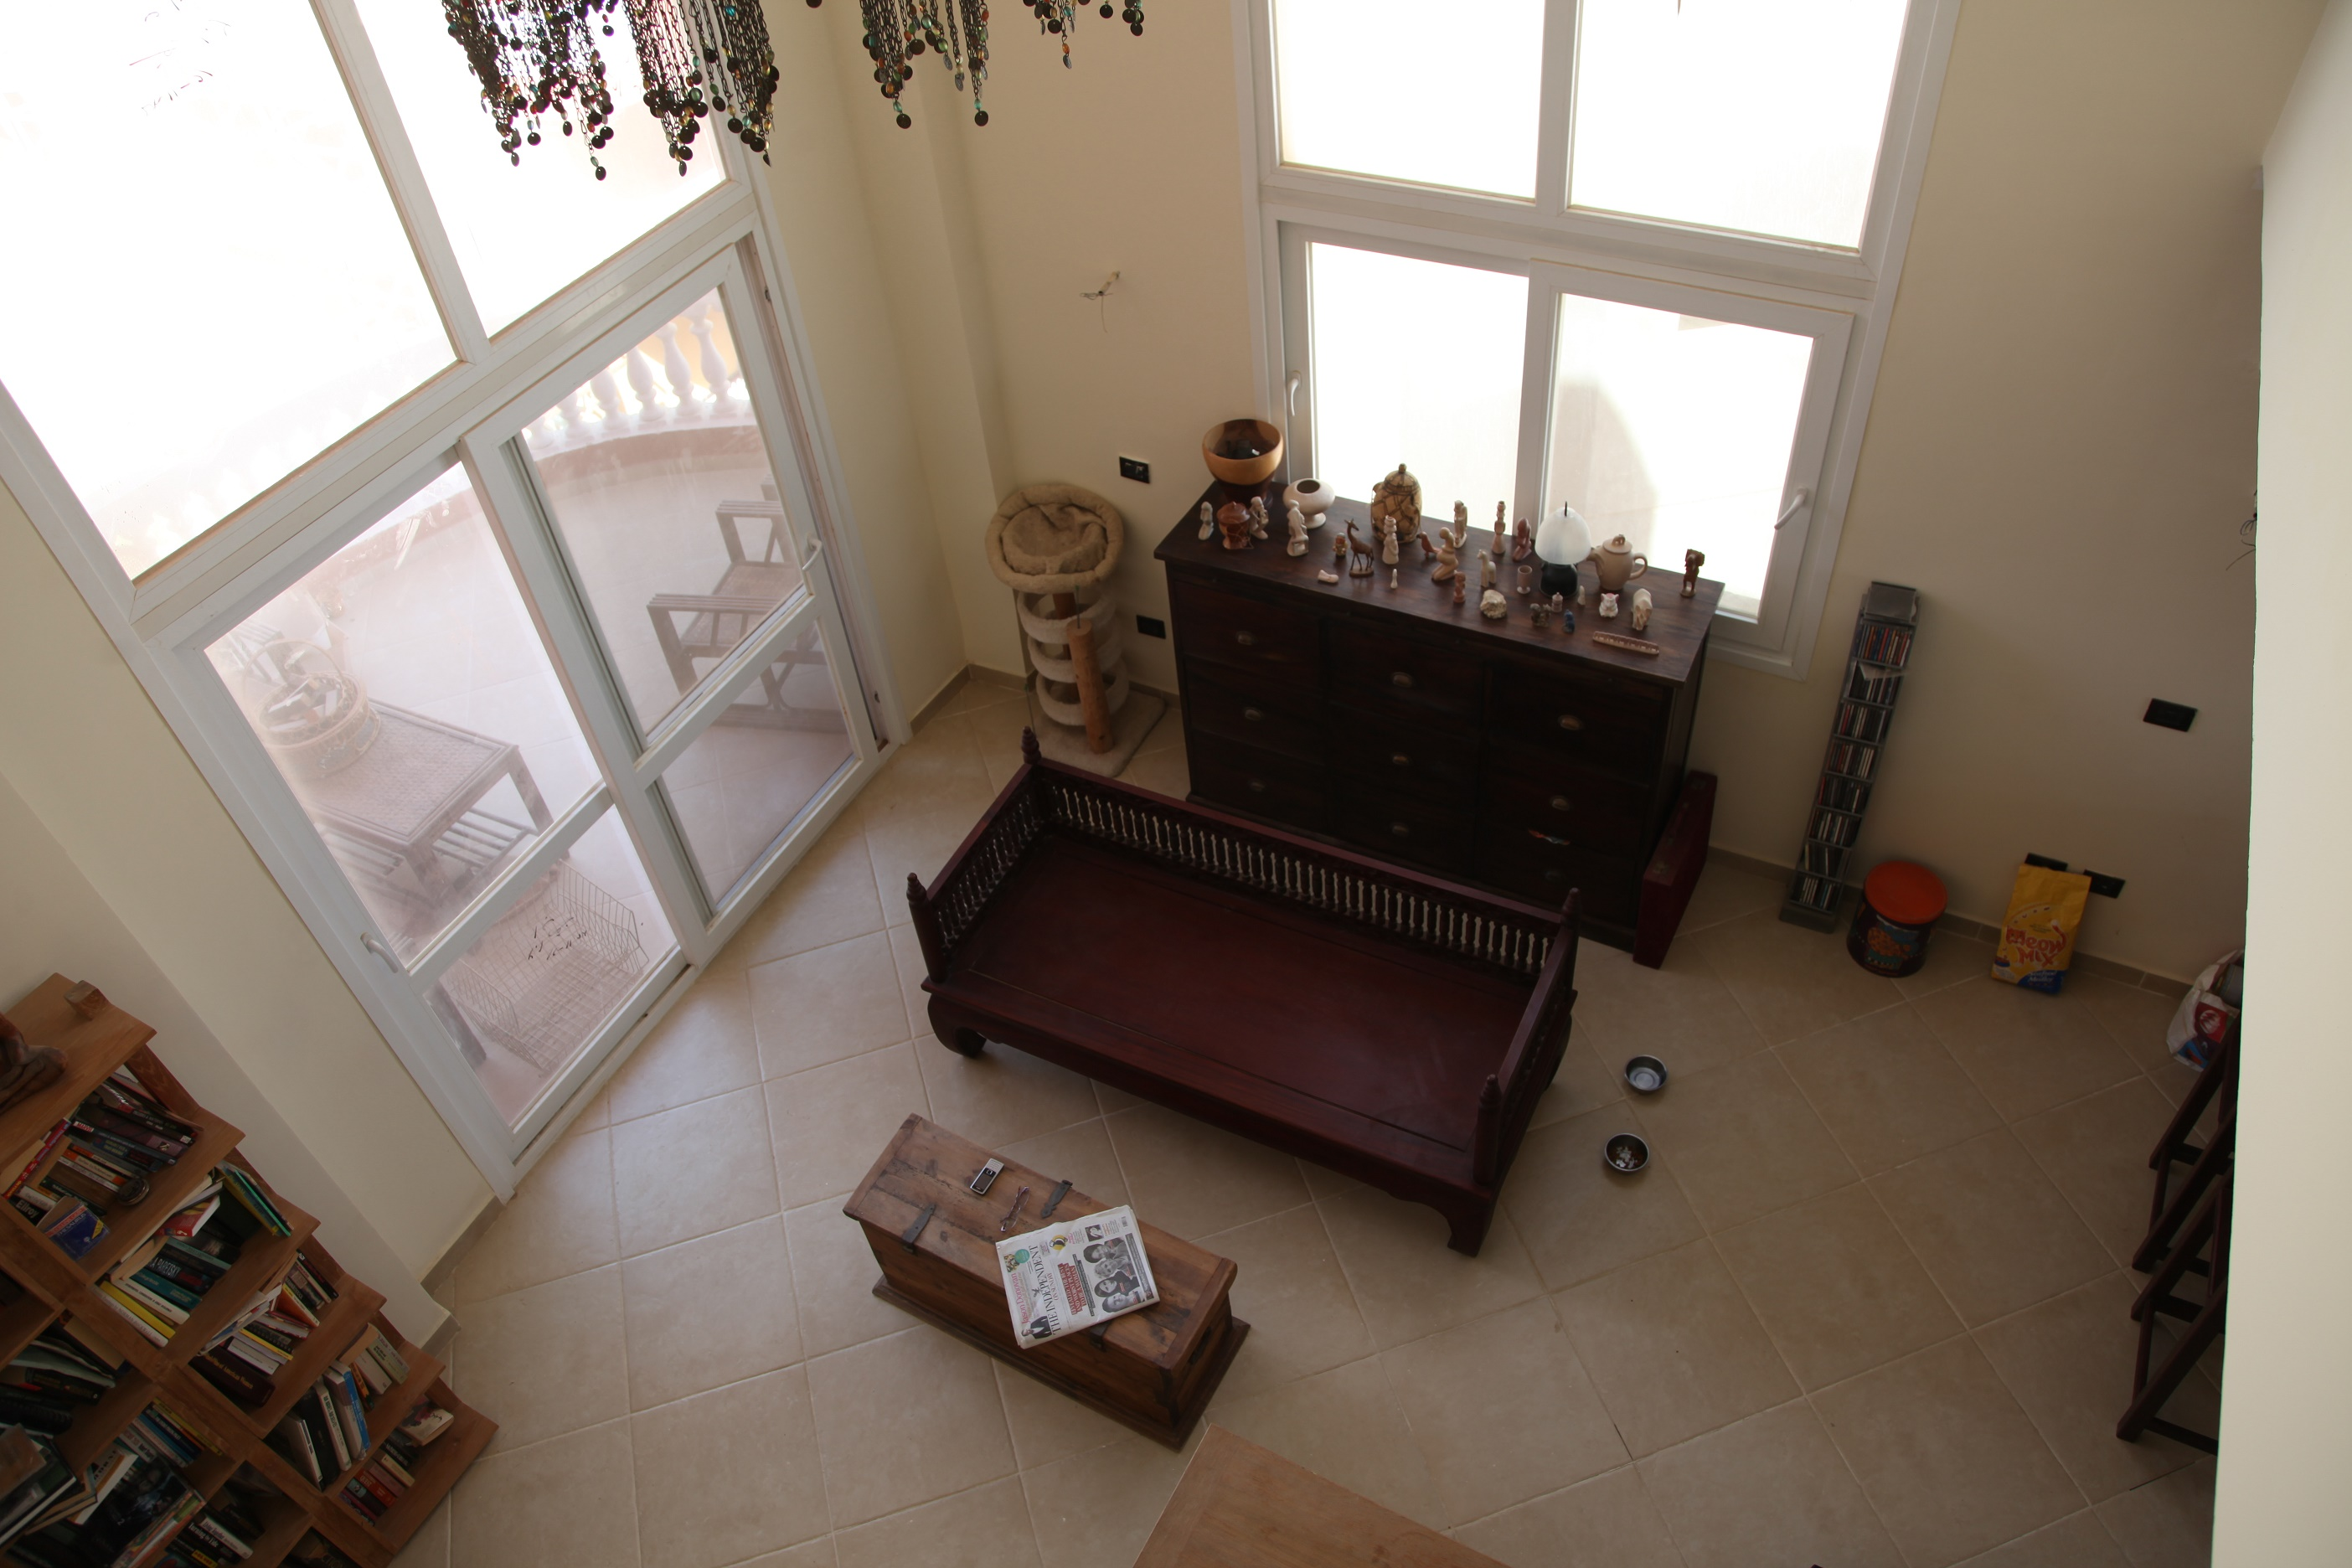 Triplex Penthouse for sale in Sharm el Sheikh, Egypt